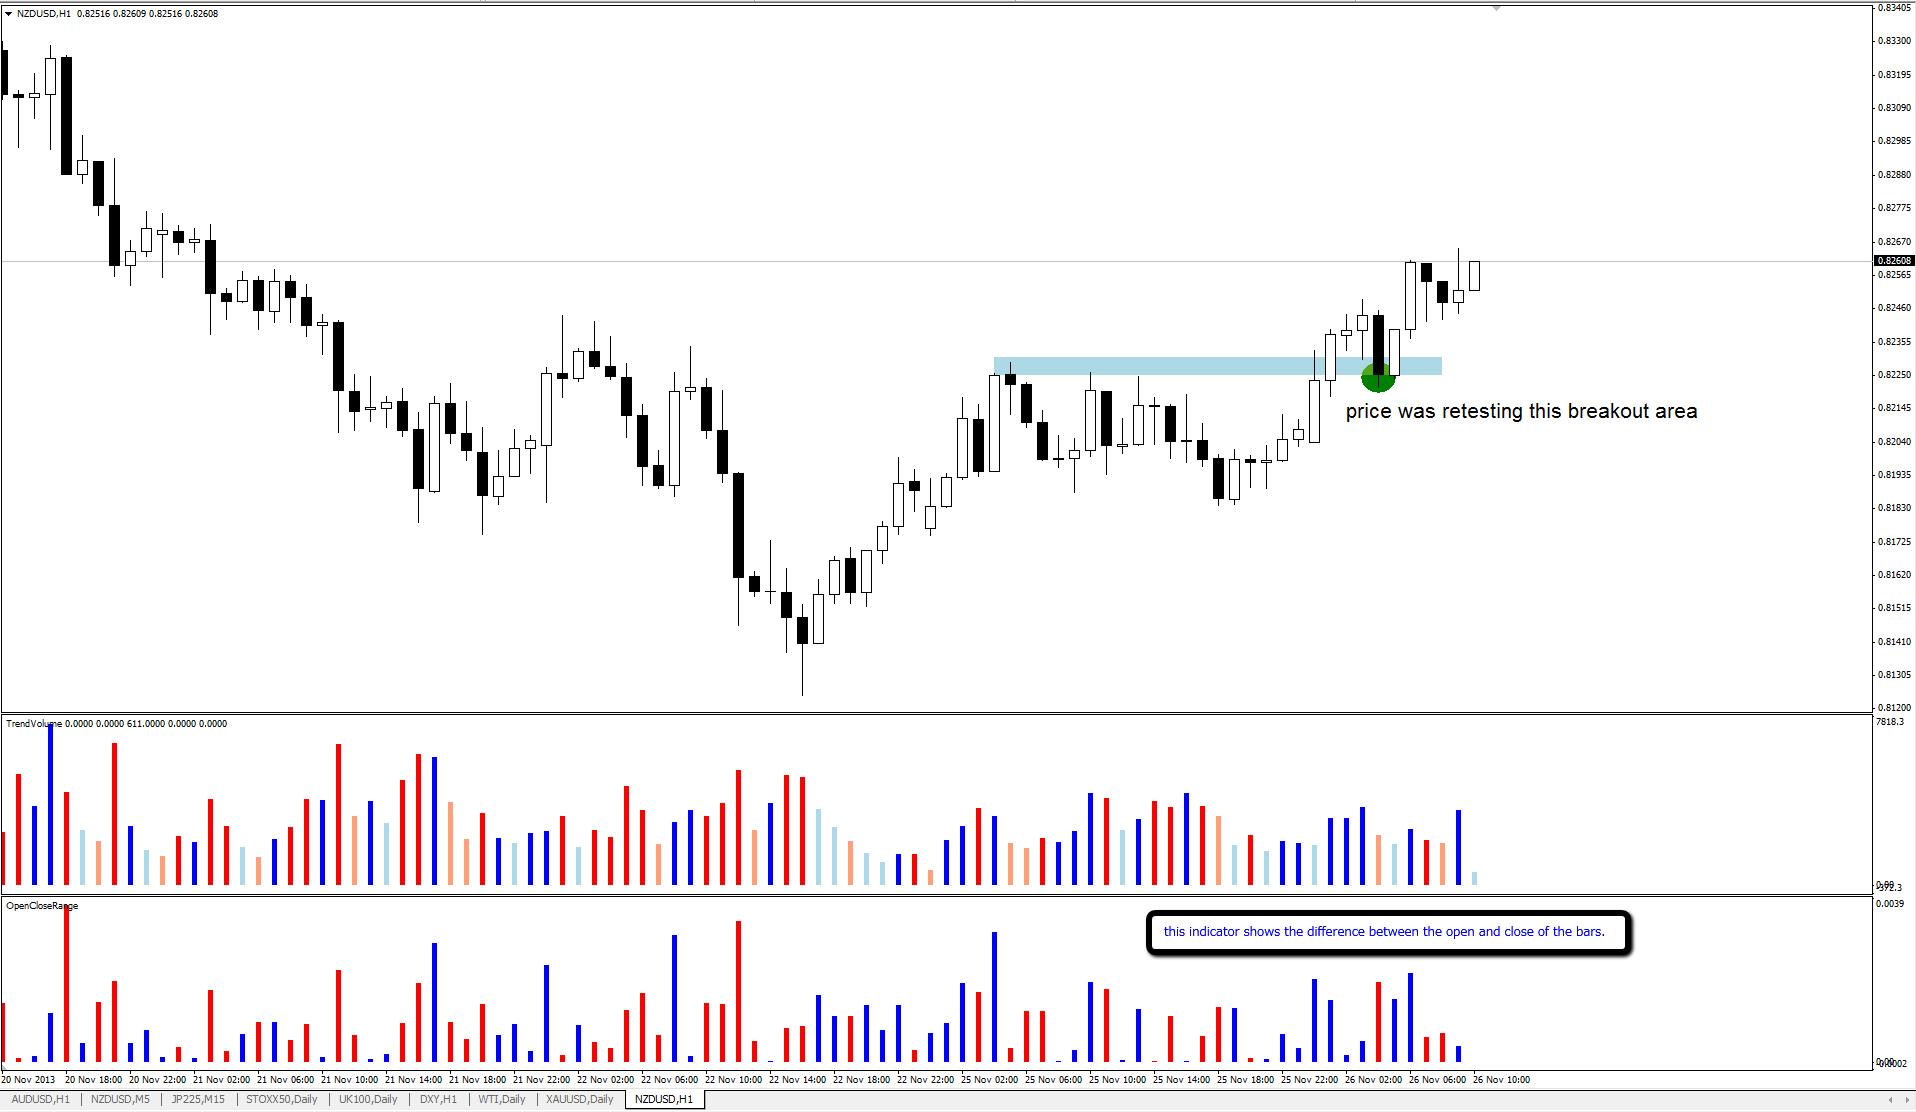 NZD/USD 1 hour chart